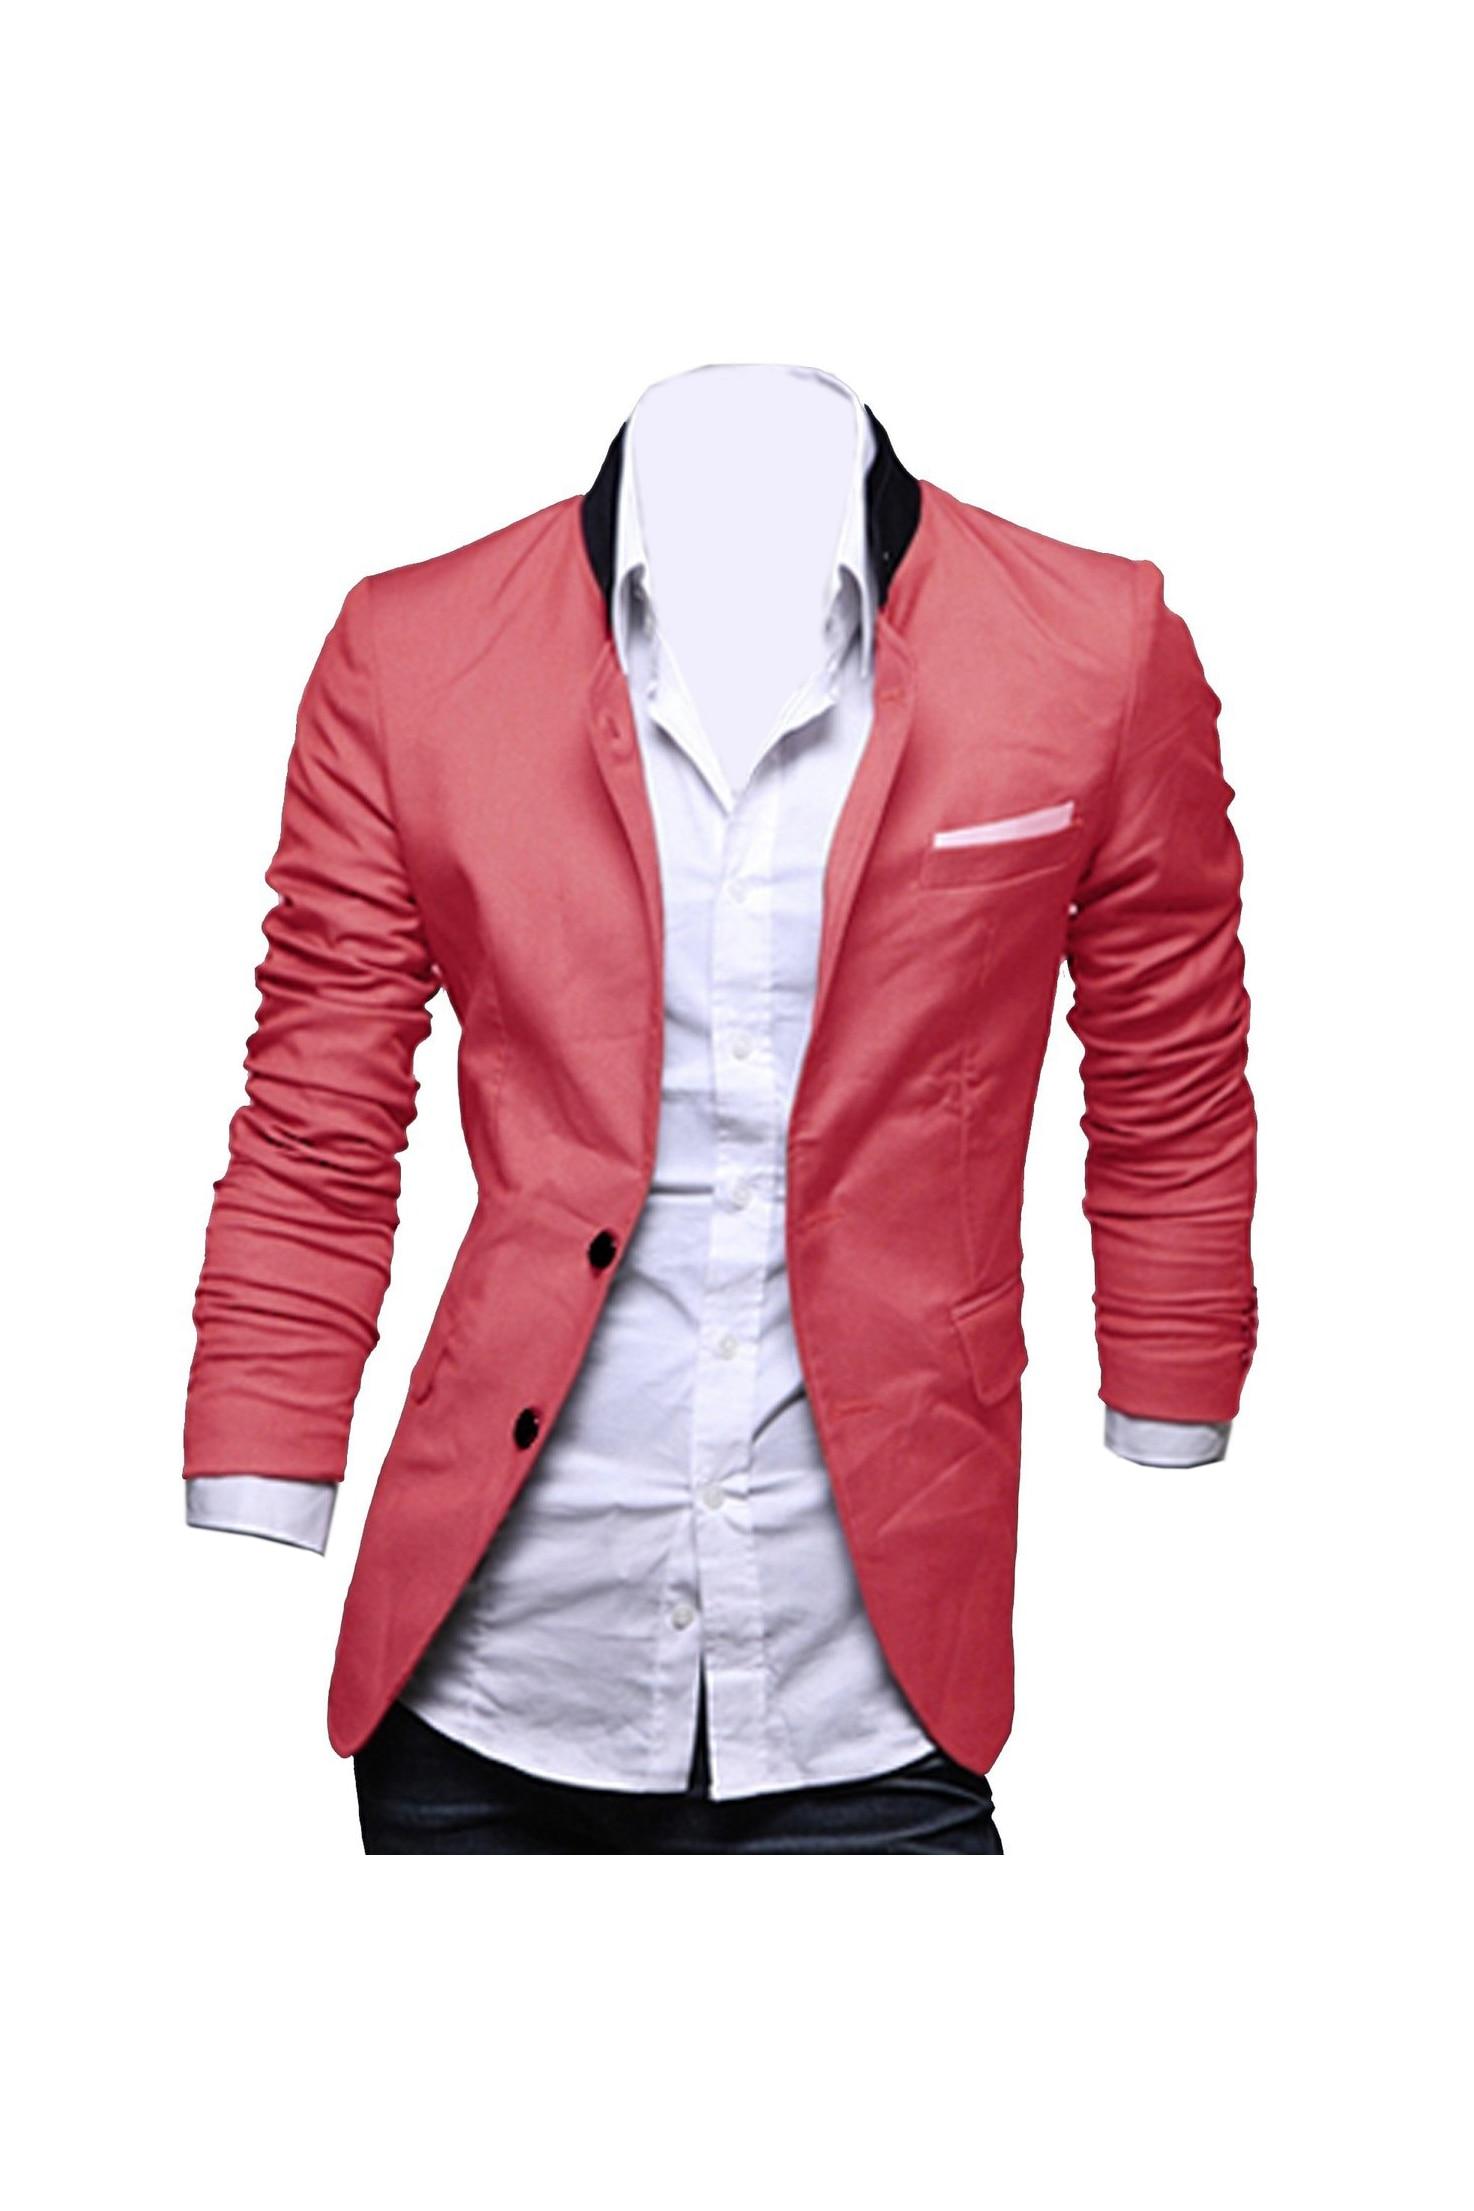 NEW Mens Slim Fit Jacket Blazer Coat Shirt XX-Large Watermelon Red